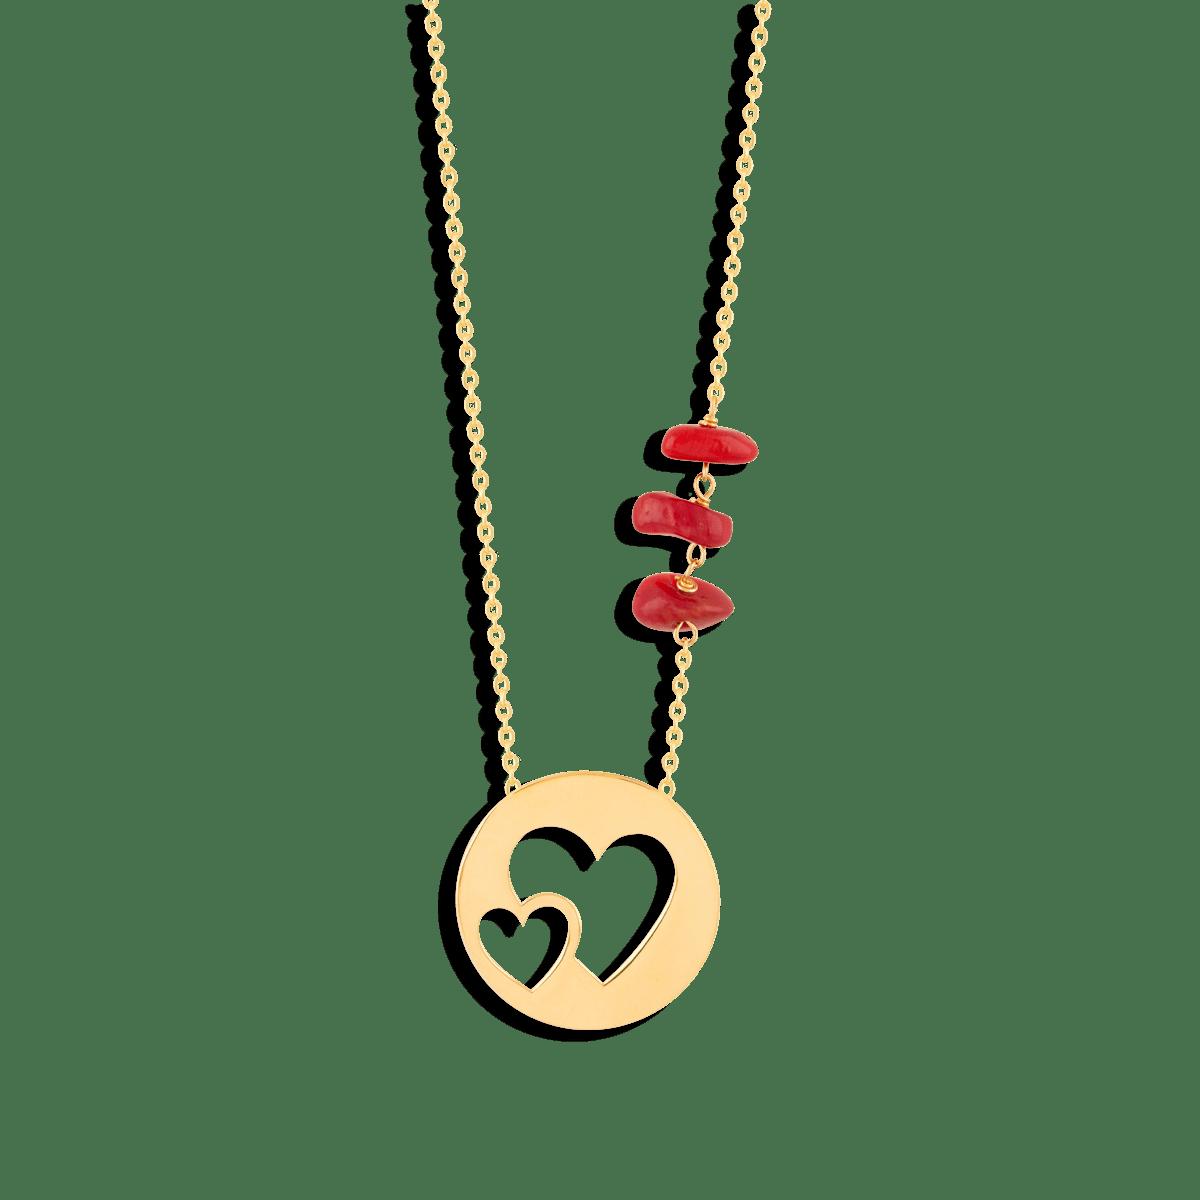 گردنبند طلا دو قلب